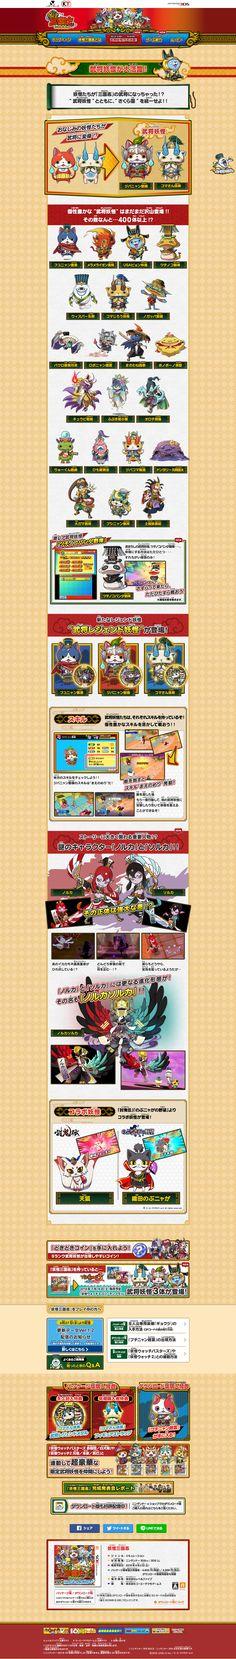 妖怪三国志 #game #webdesign